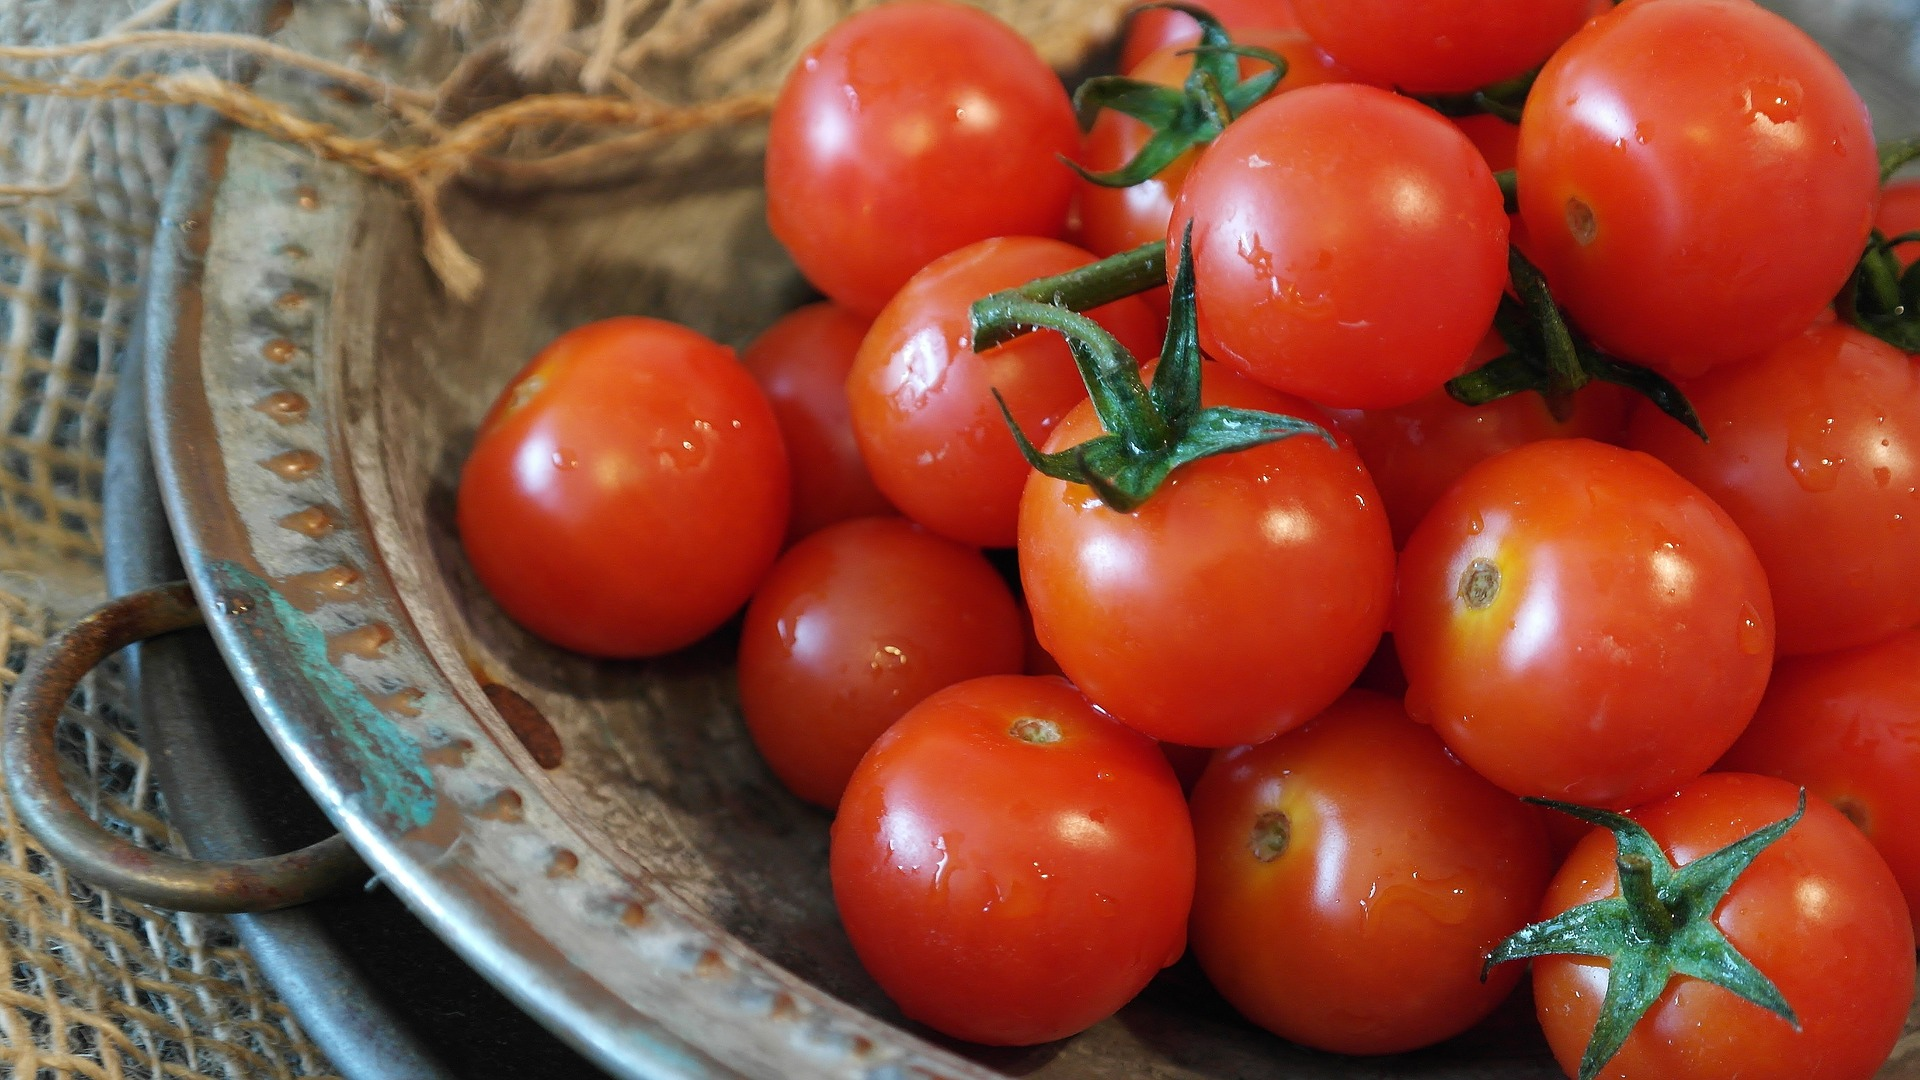 tomatoes-2559809_1920